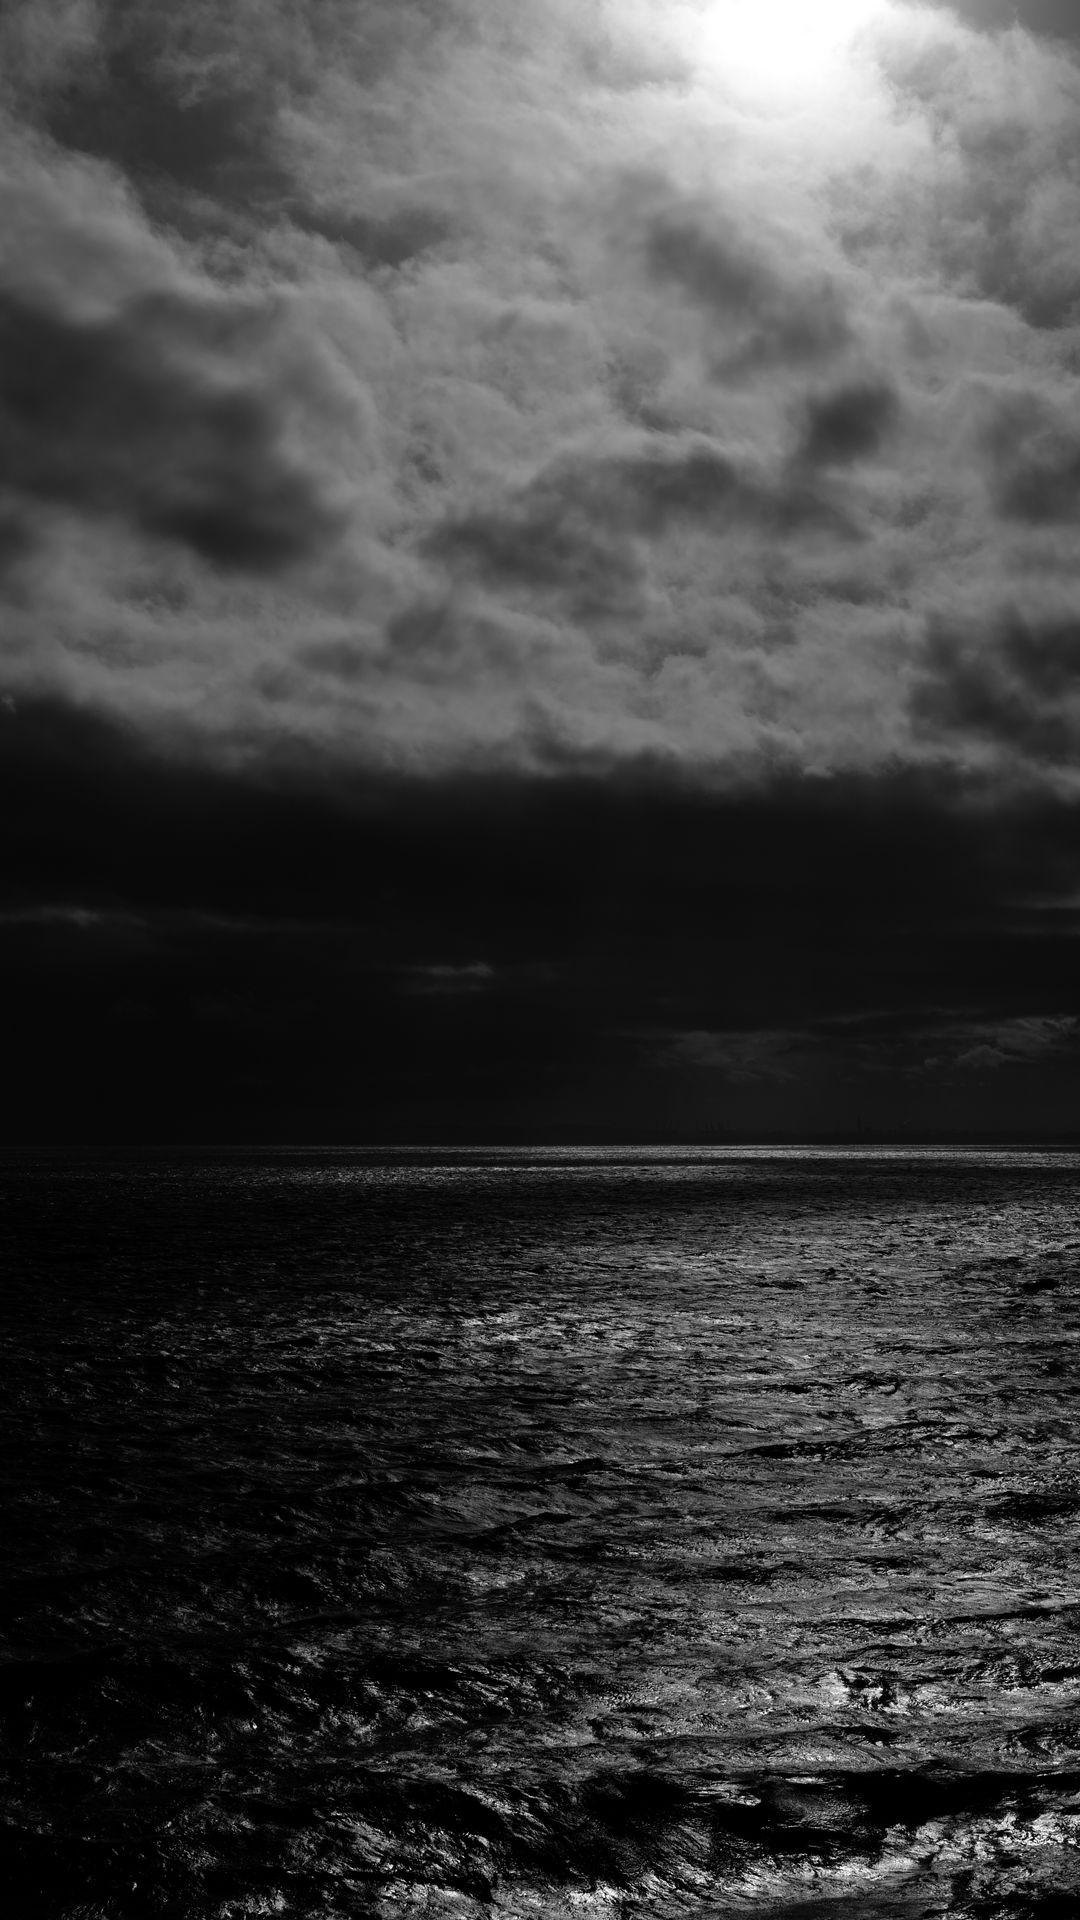 1080x1920 Wallpaper sea, horizon, bw, overcast, clouds, ripples